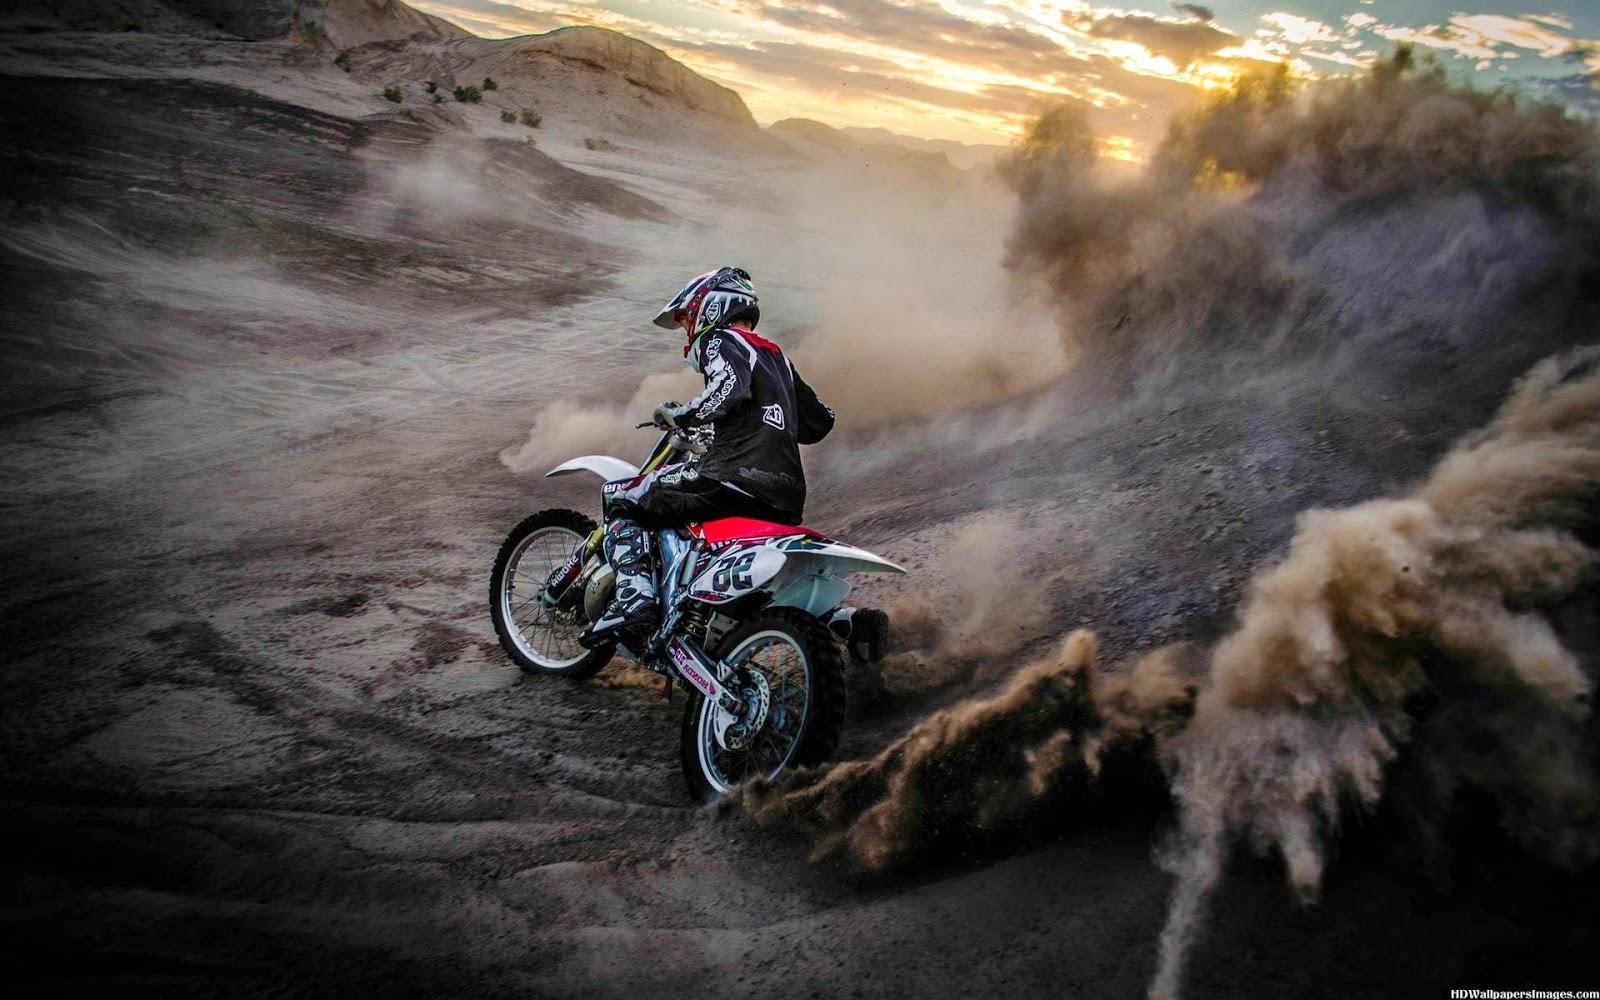 bikes stunts hd wallpapers top stunts images wallpapers